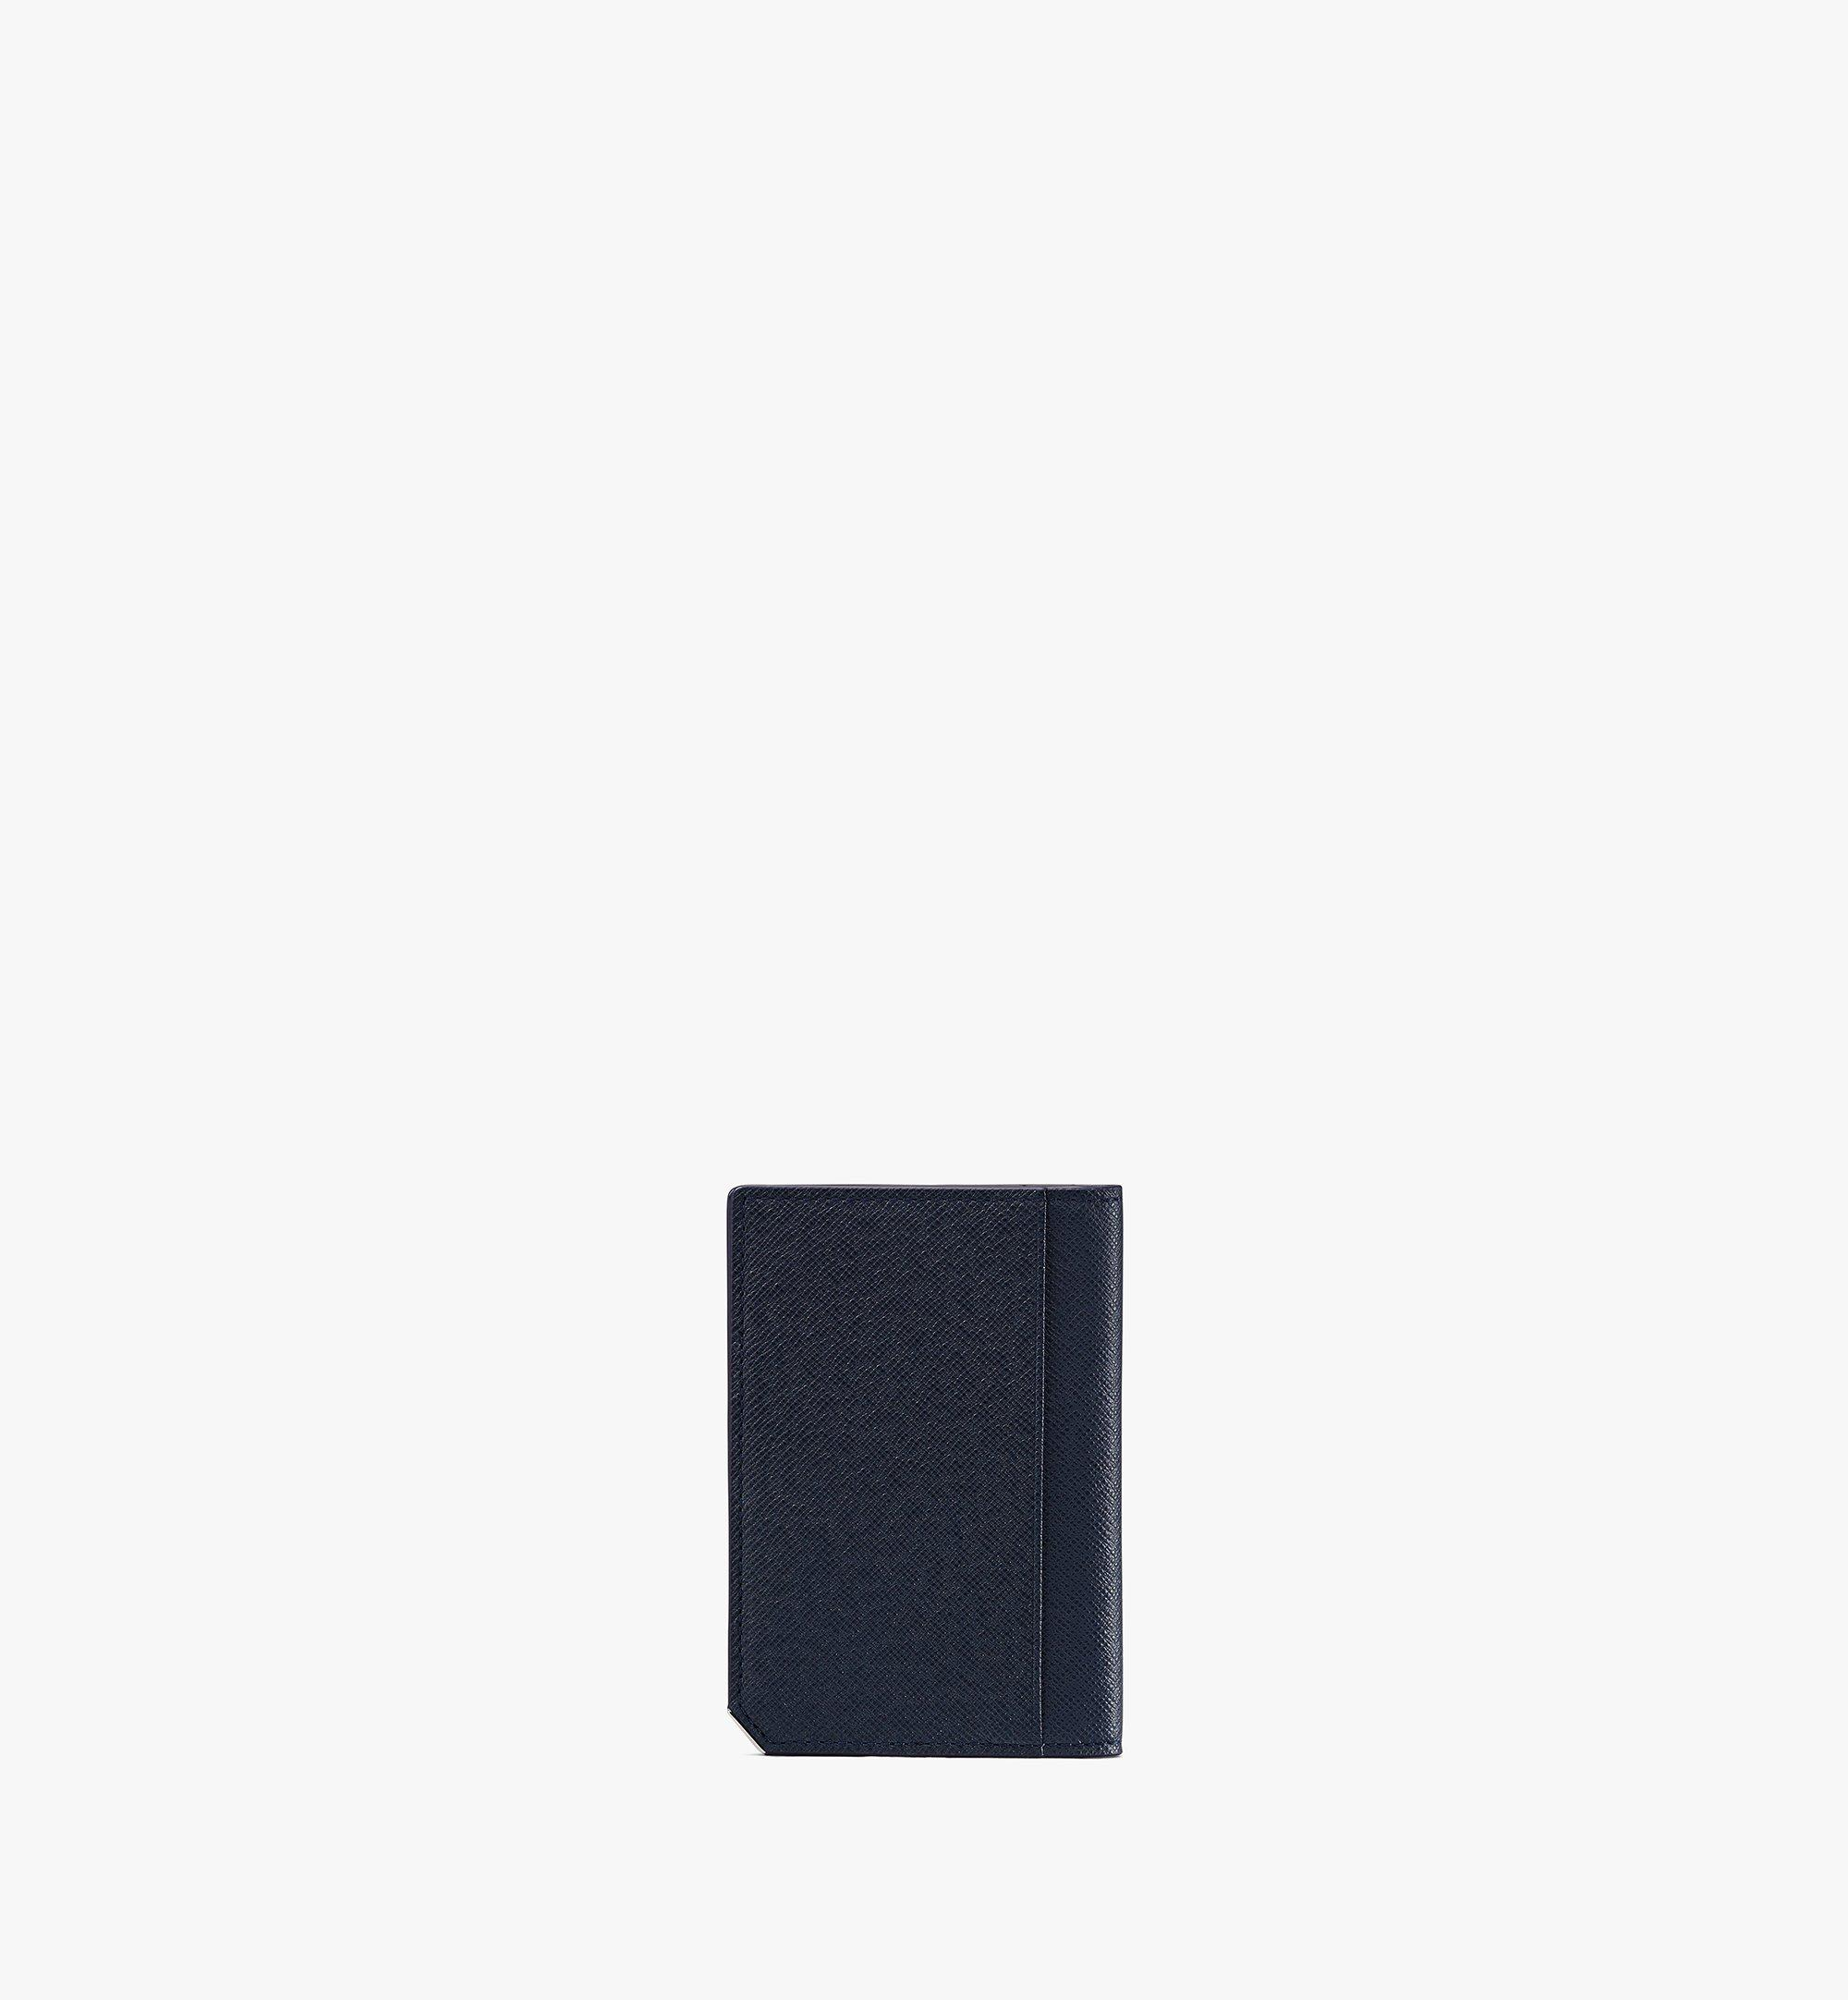 MCM 〈ニュー ブリック〉二つ折りカードウォレット Navy MXAASLL03VY001 Alternate View 2